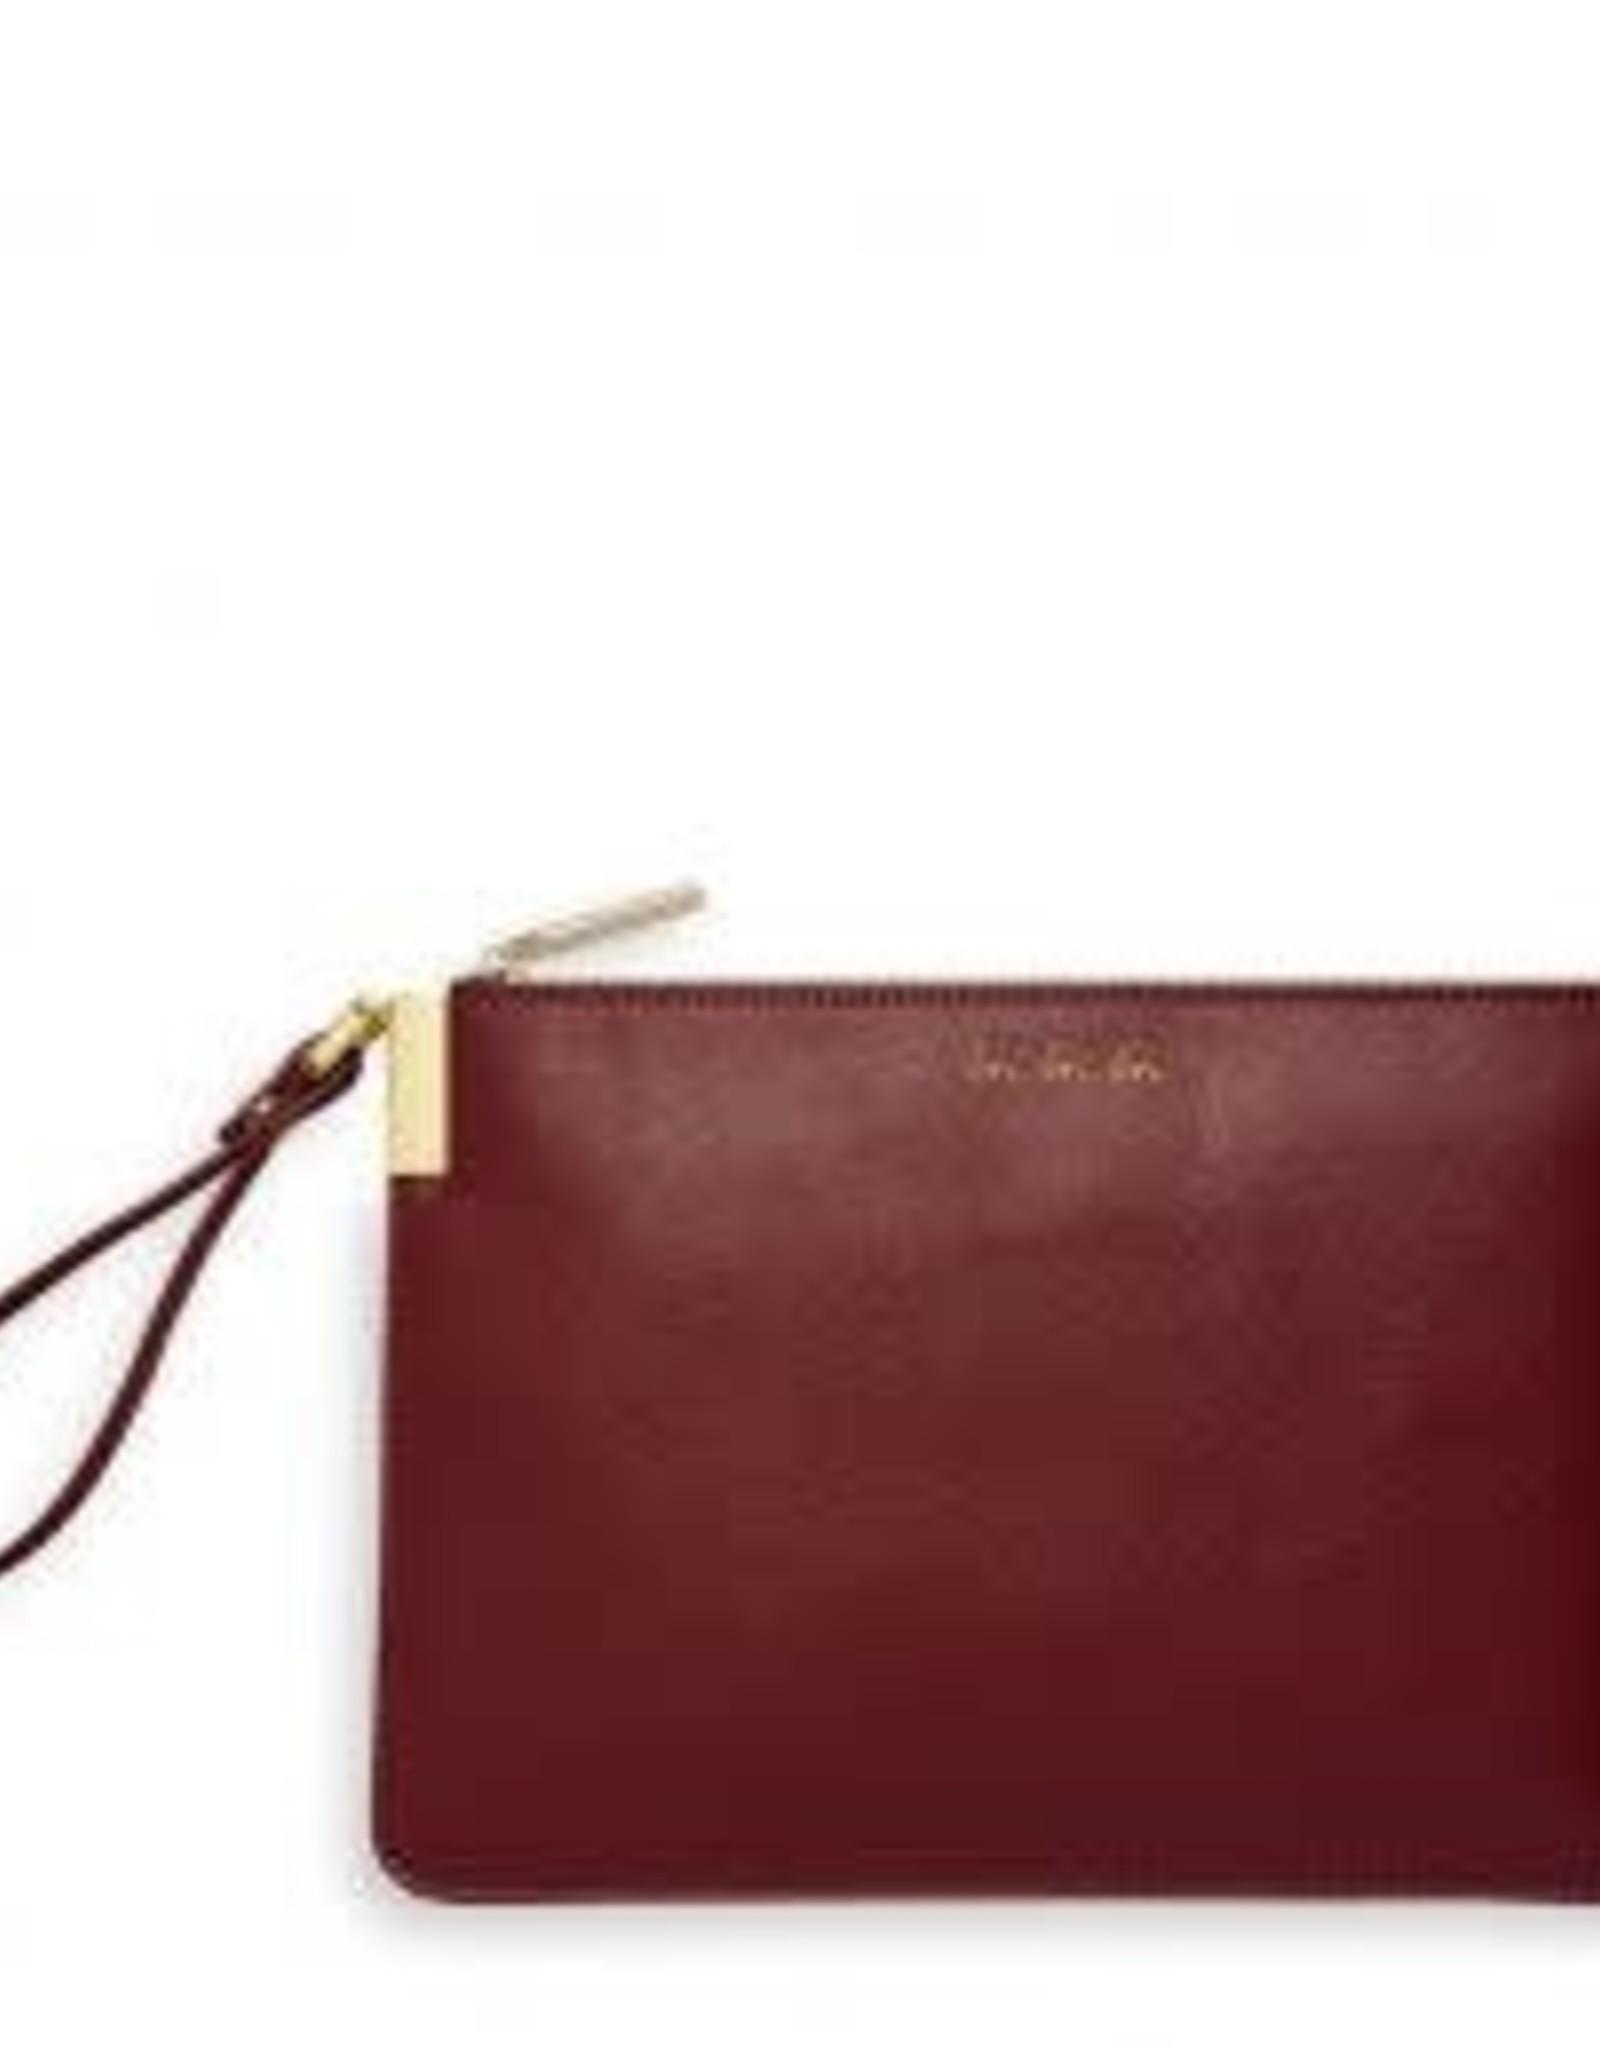 Katie Loxton Secret Message Clutch - Love Love Love/Heart of Gold Burgundy